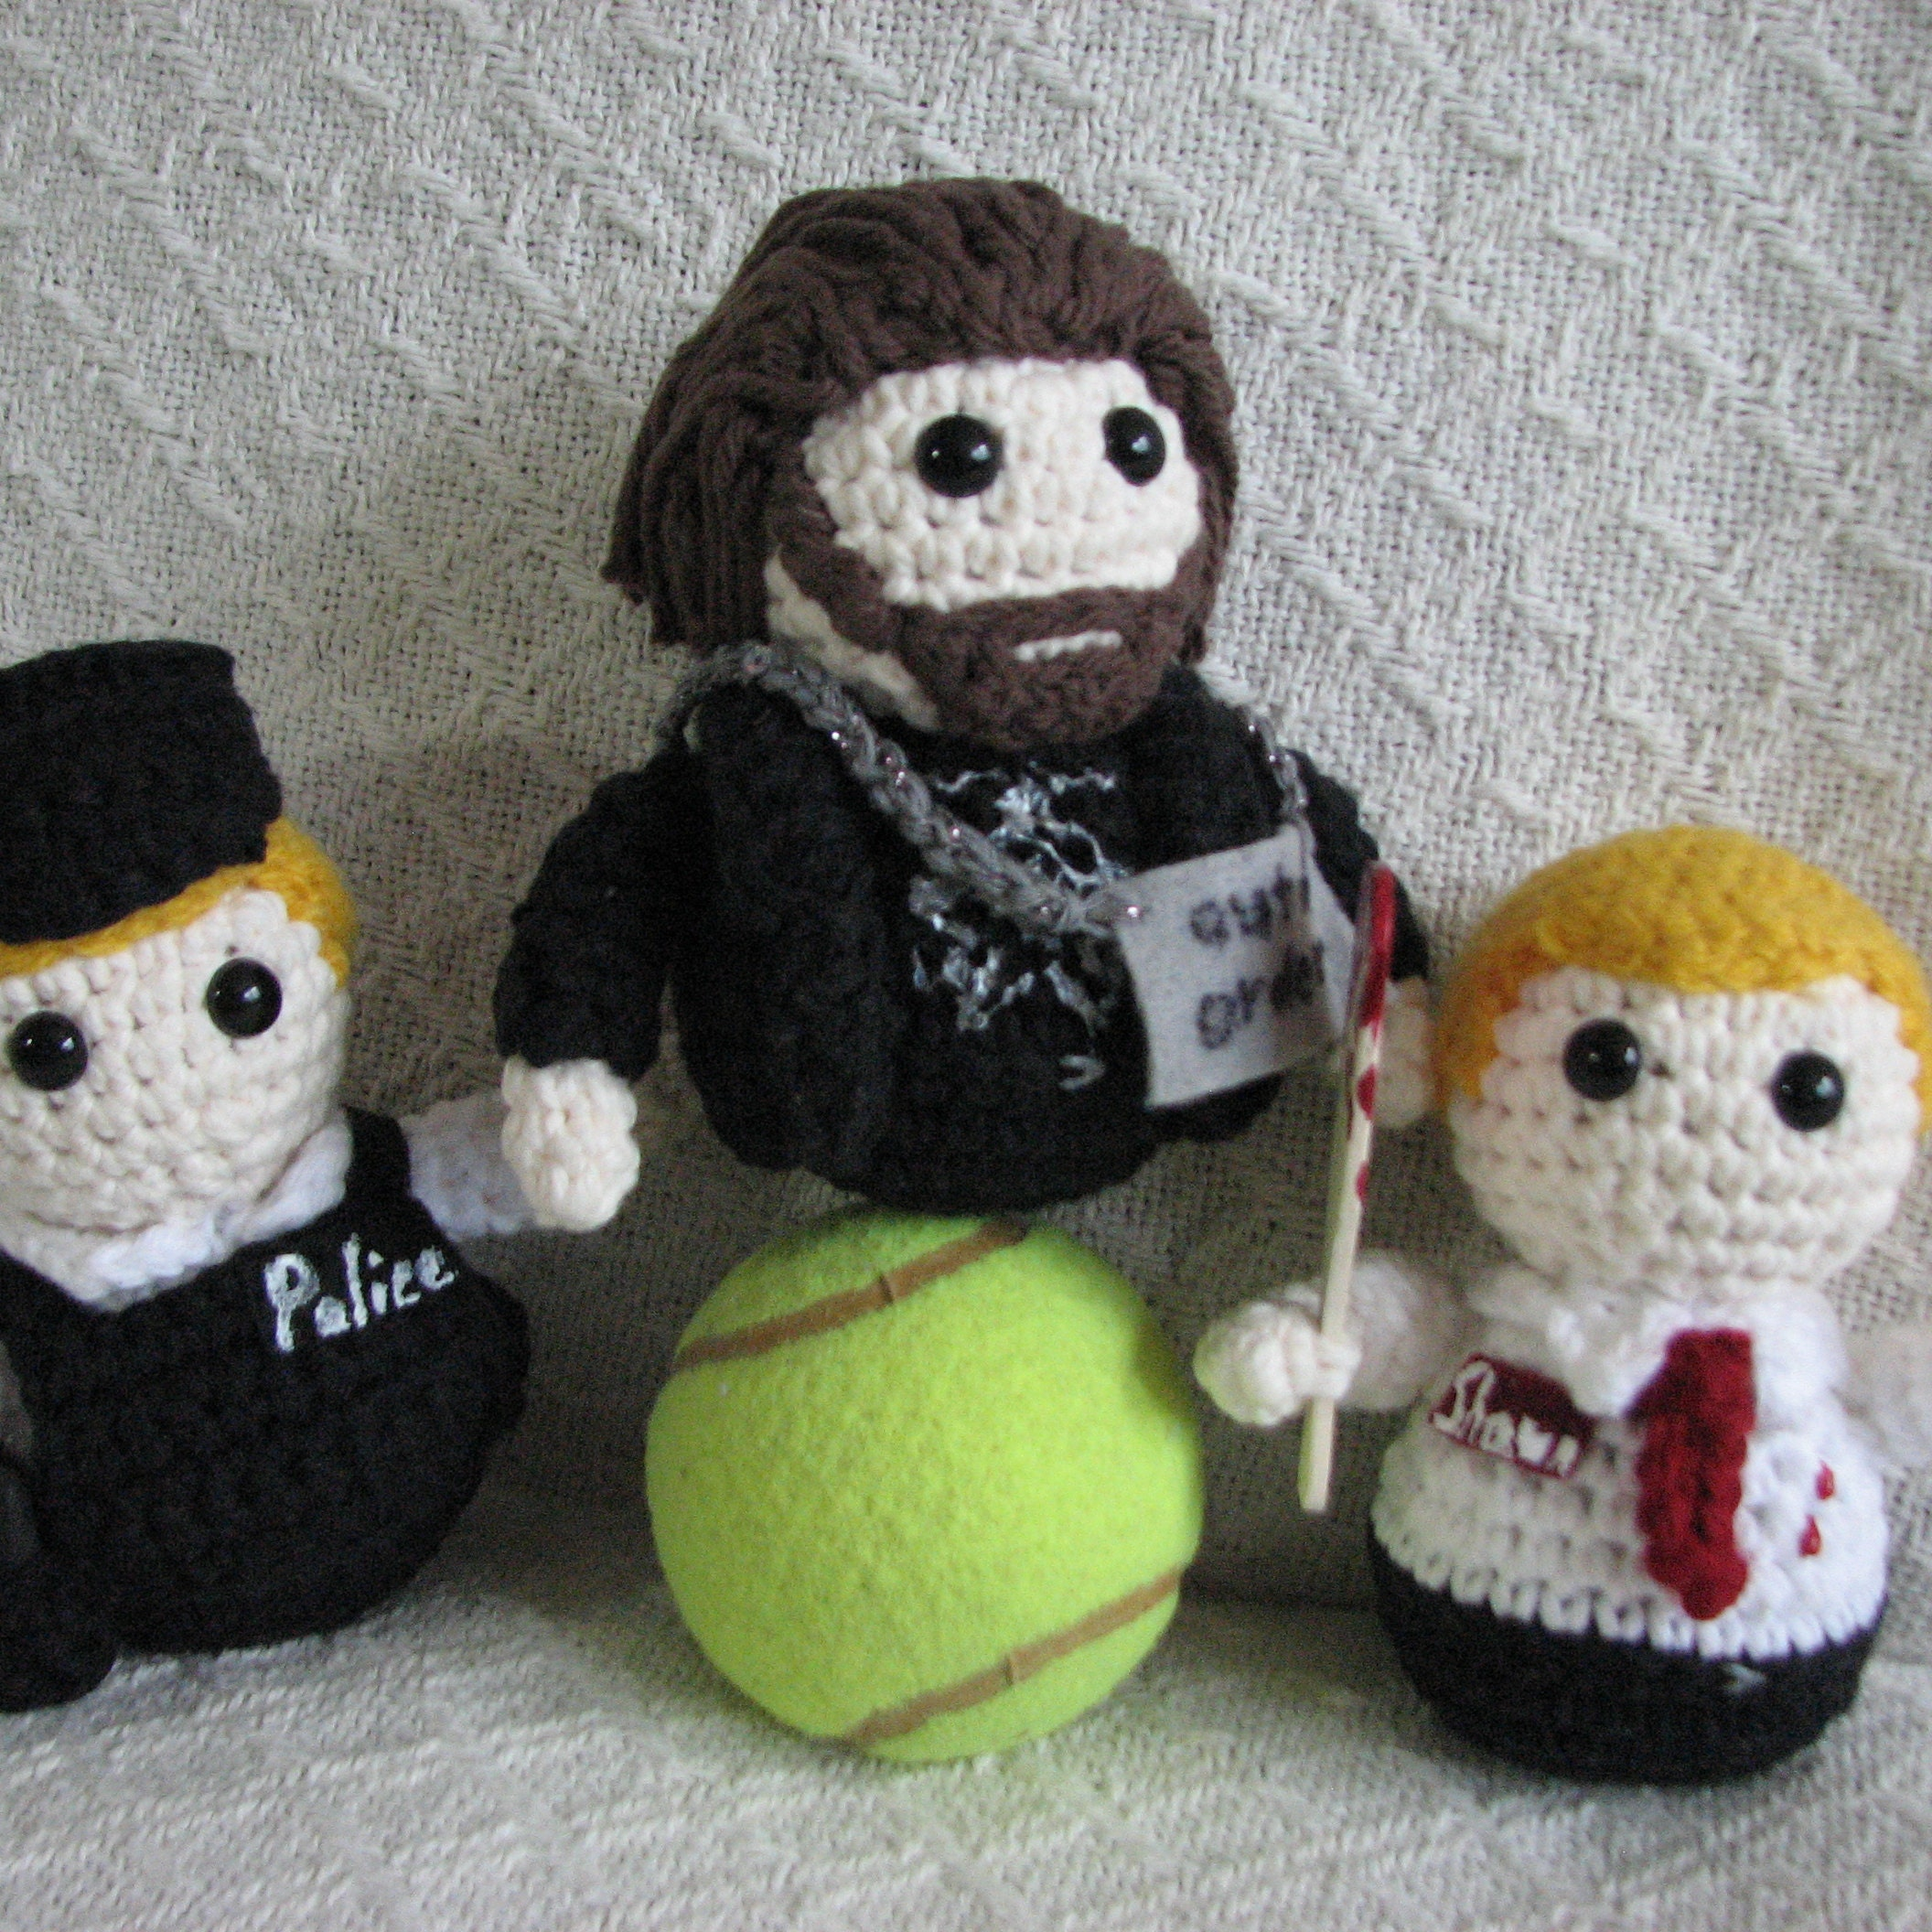 Catbug Handmade Crochet Doll Etsy